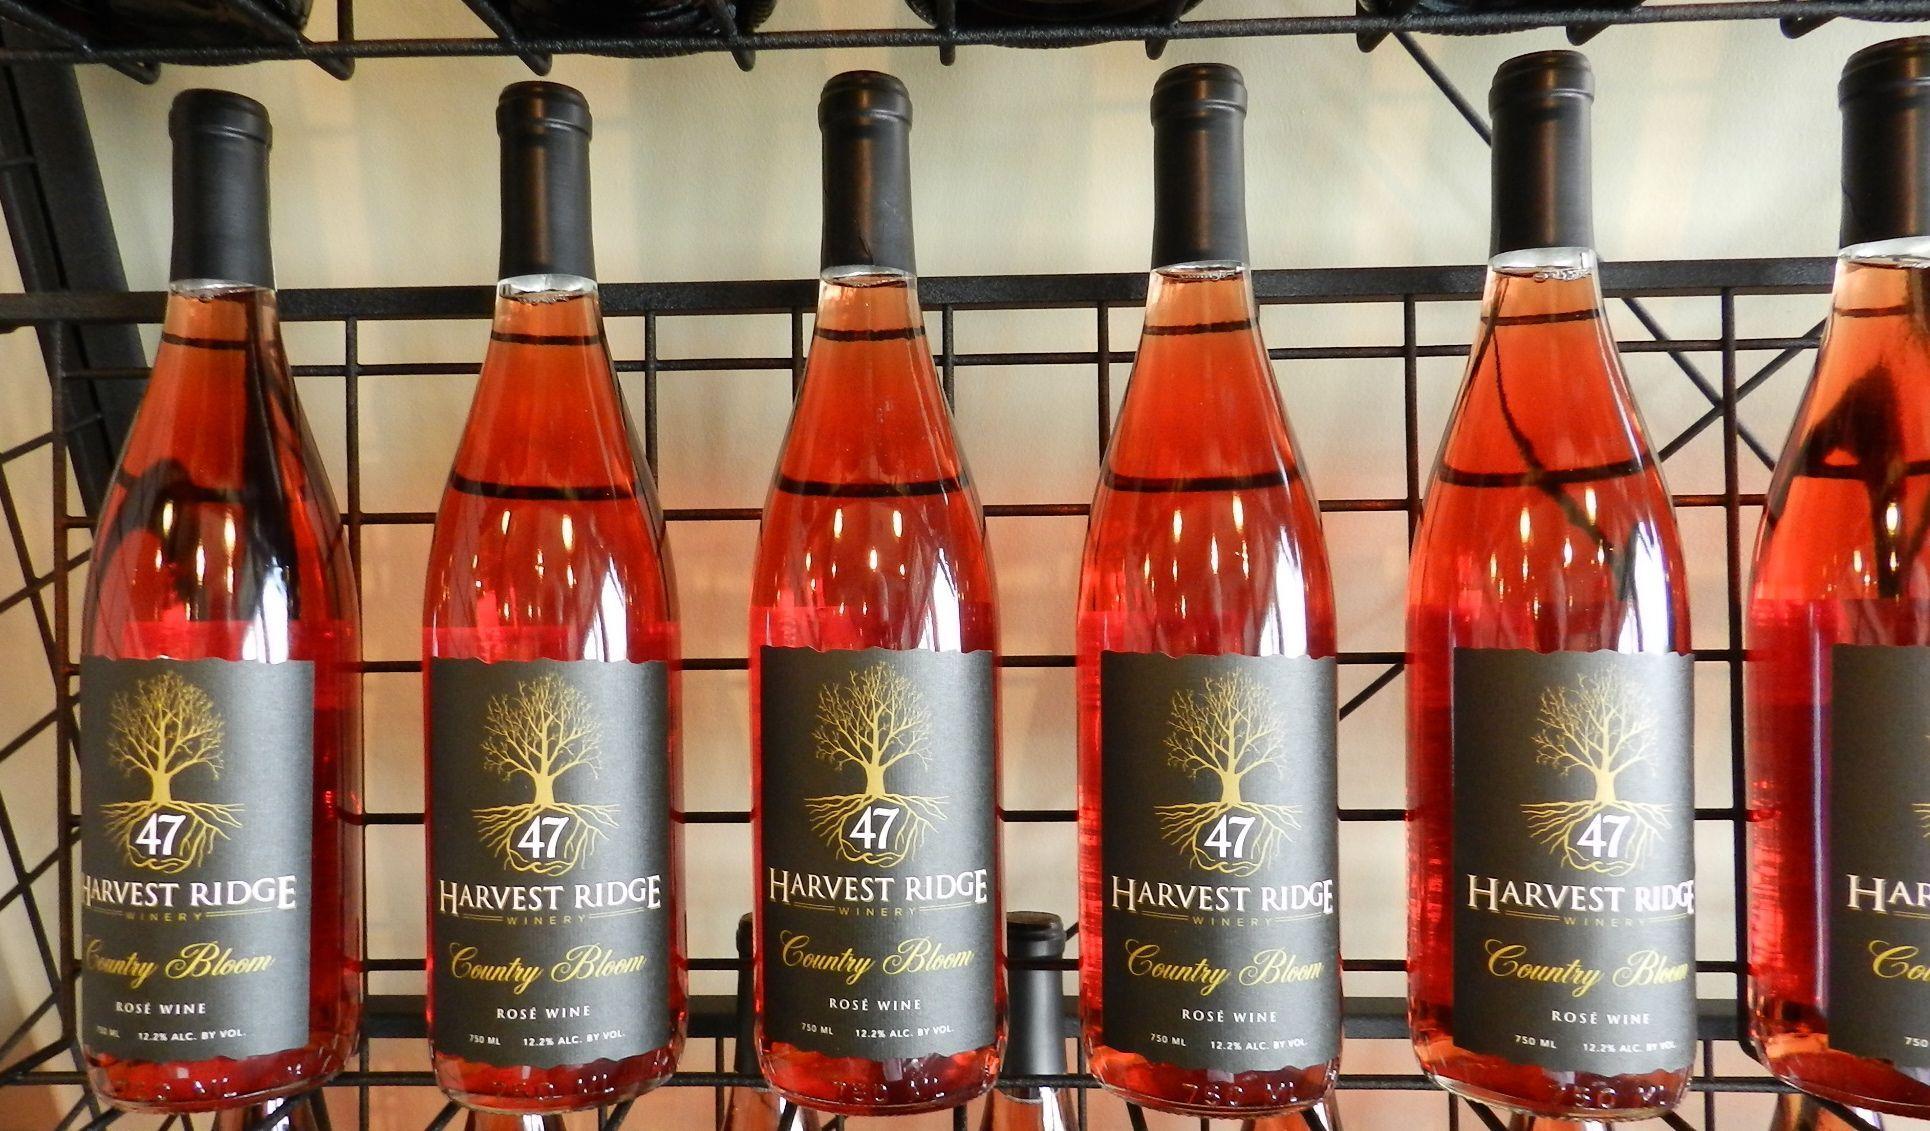 Harvest Ridge Winery Delaware Ridge Winery Winery Harvest